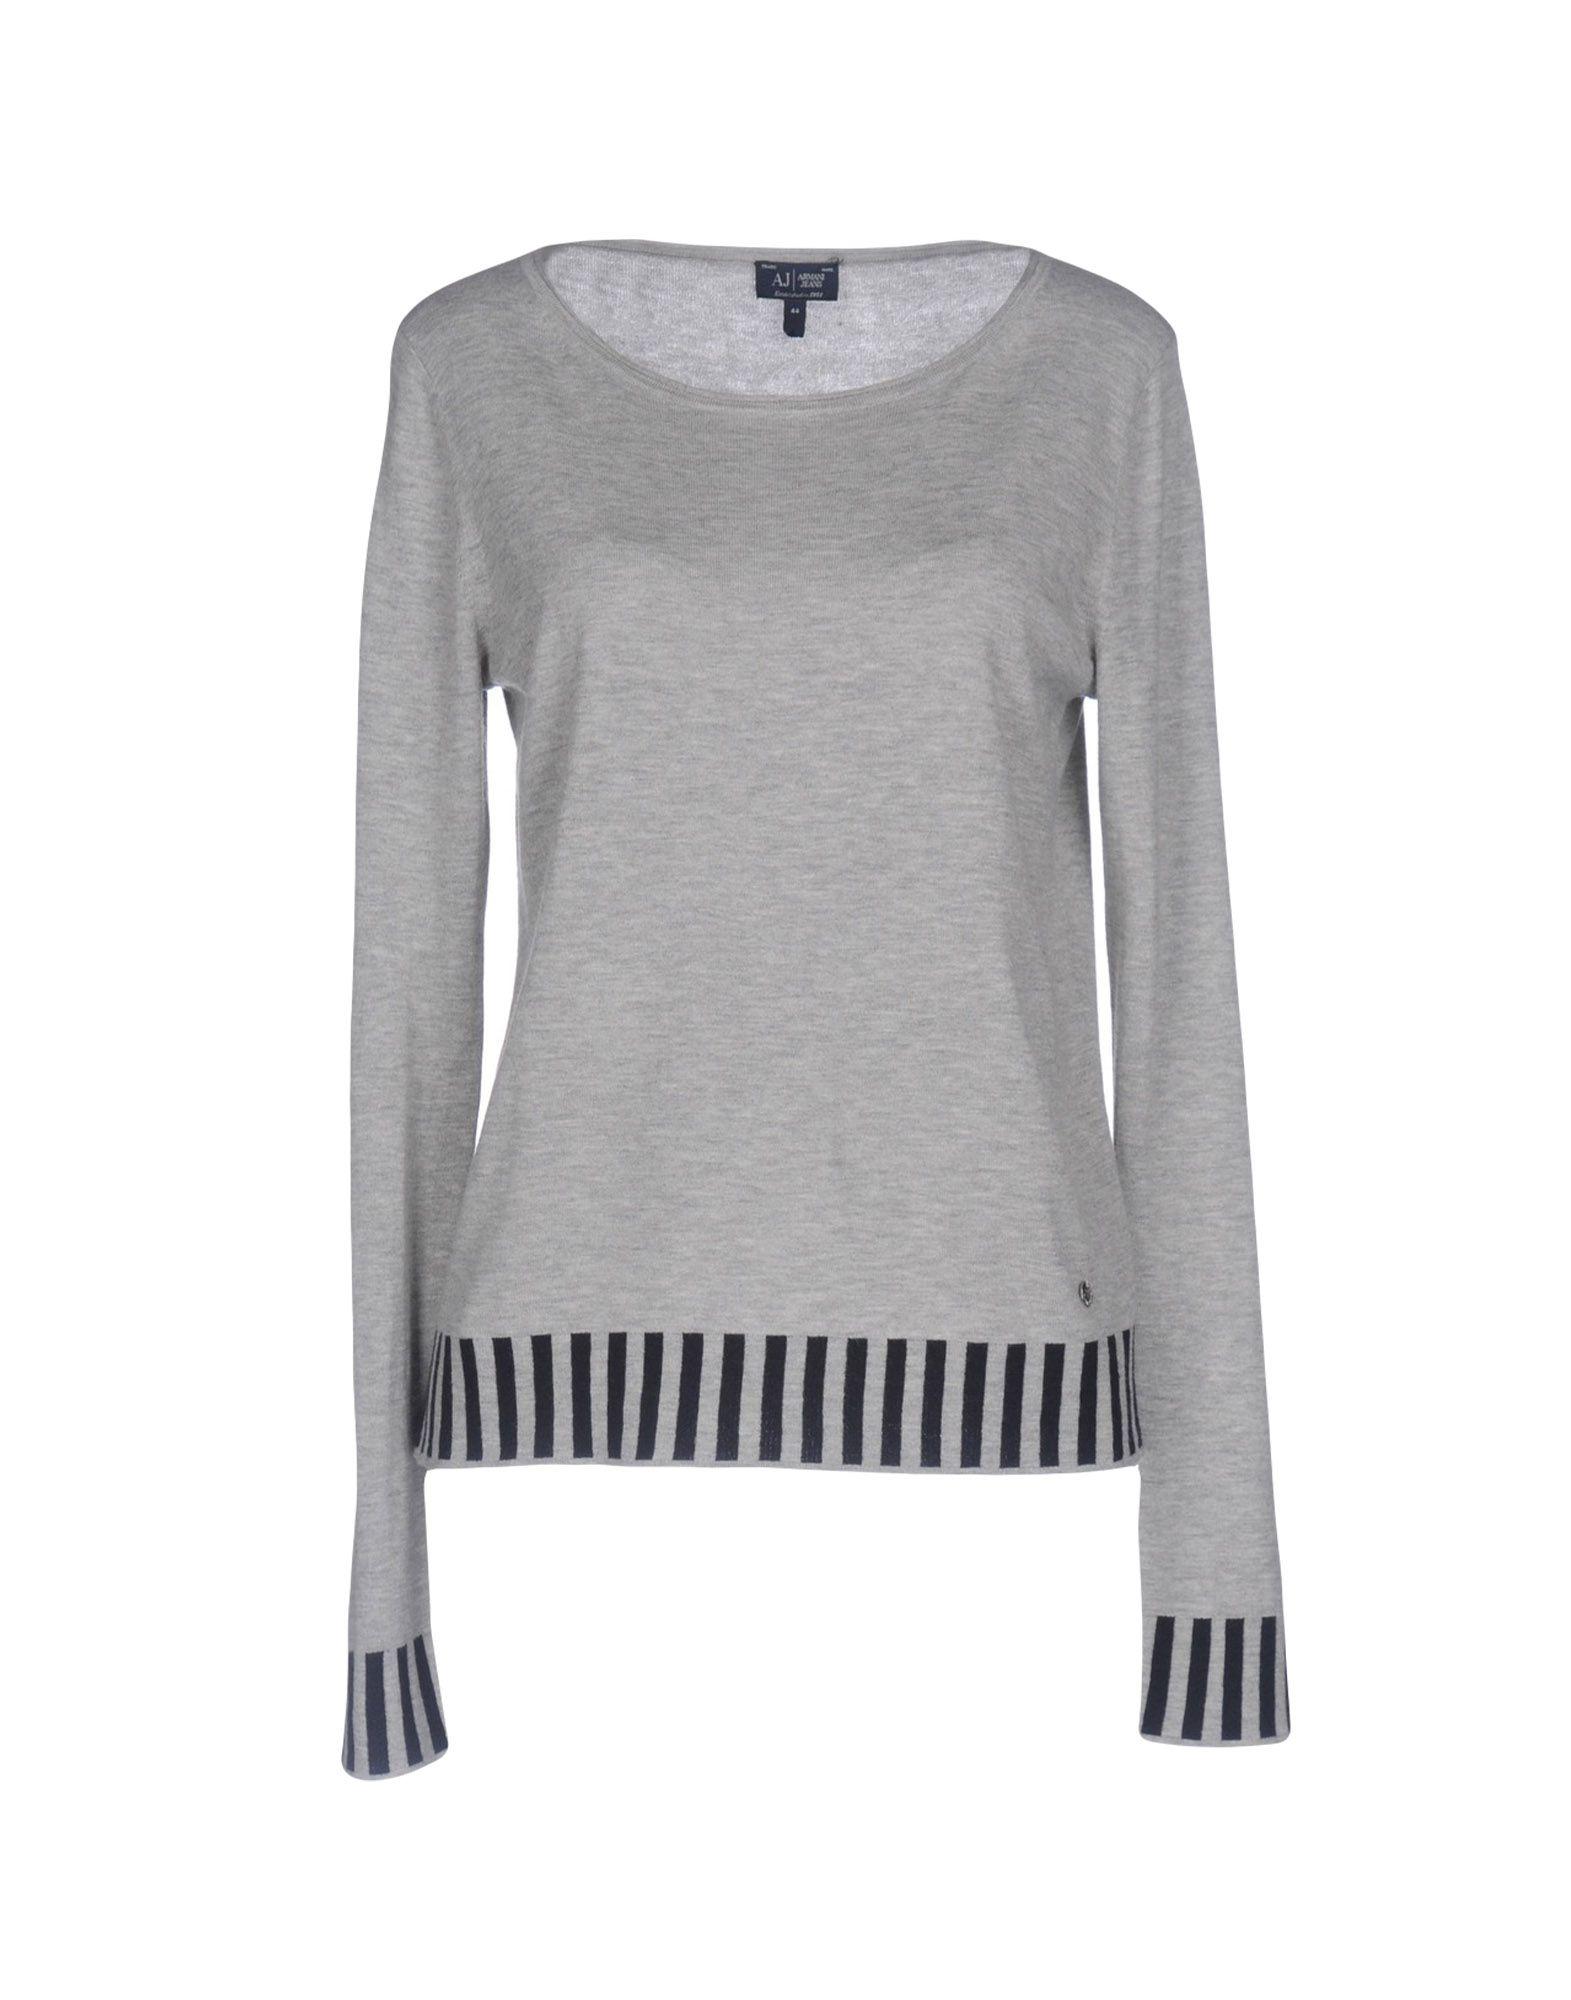 ARMANI JEANS Damen Pullover Farbe Hellgrau Größe 4